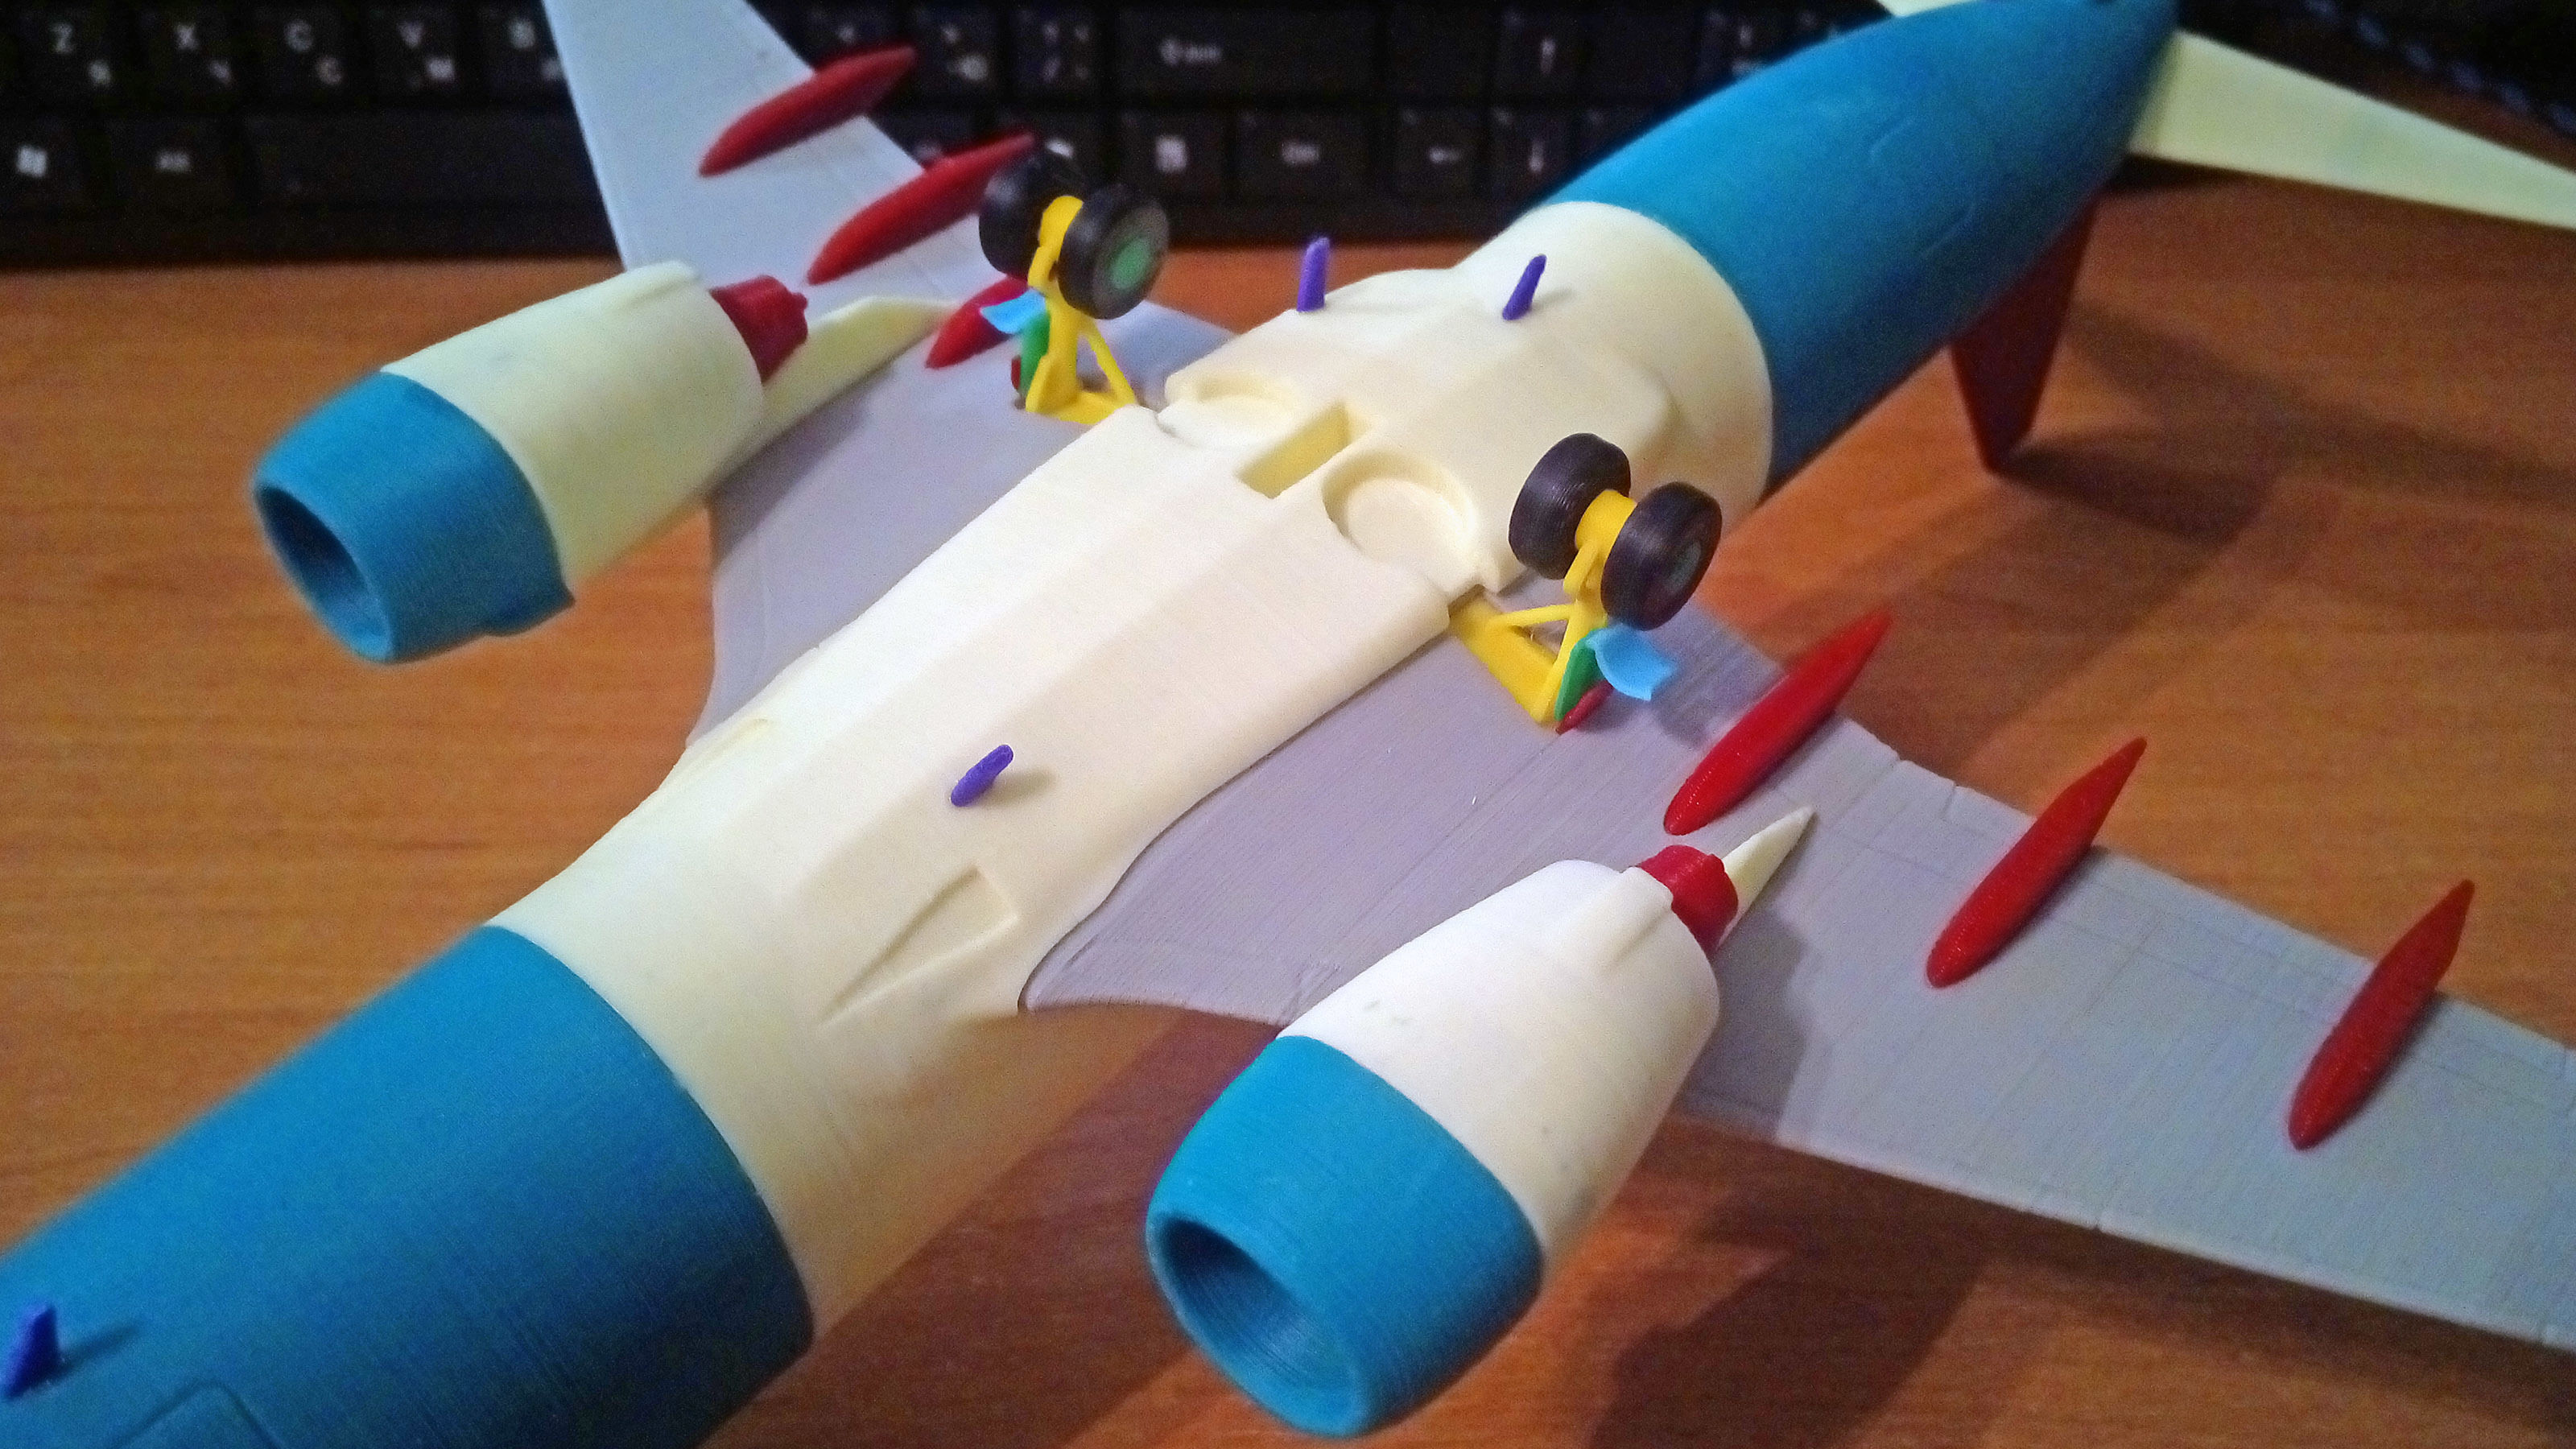 121214 Boeing 737-800 Split Scimitar Down